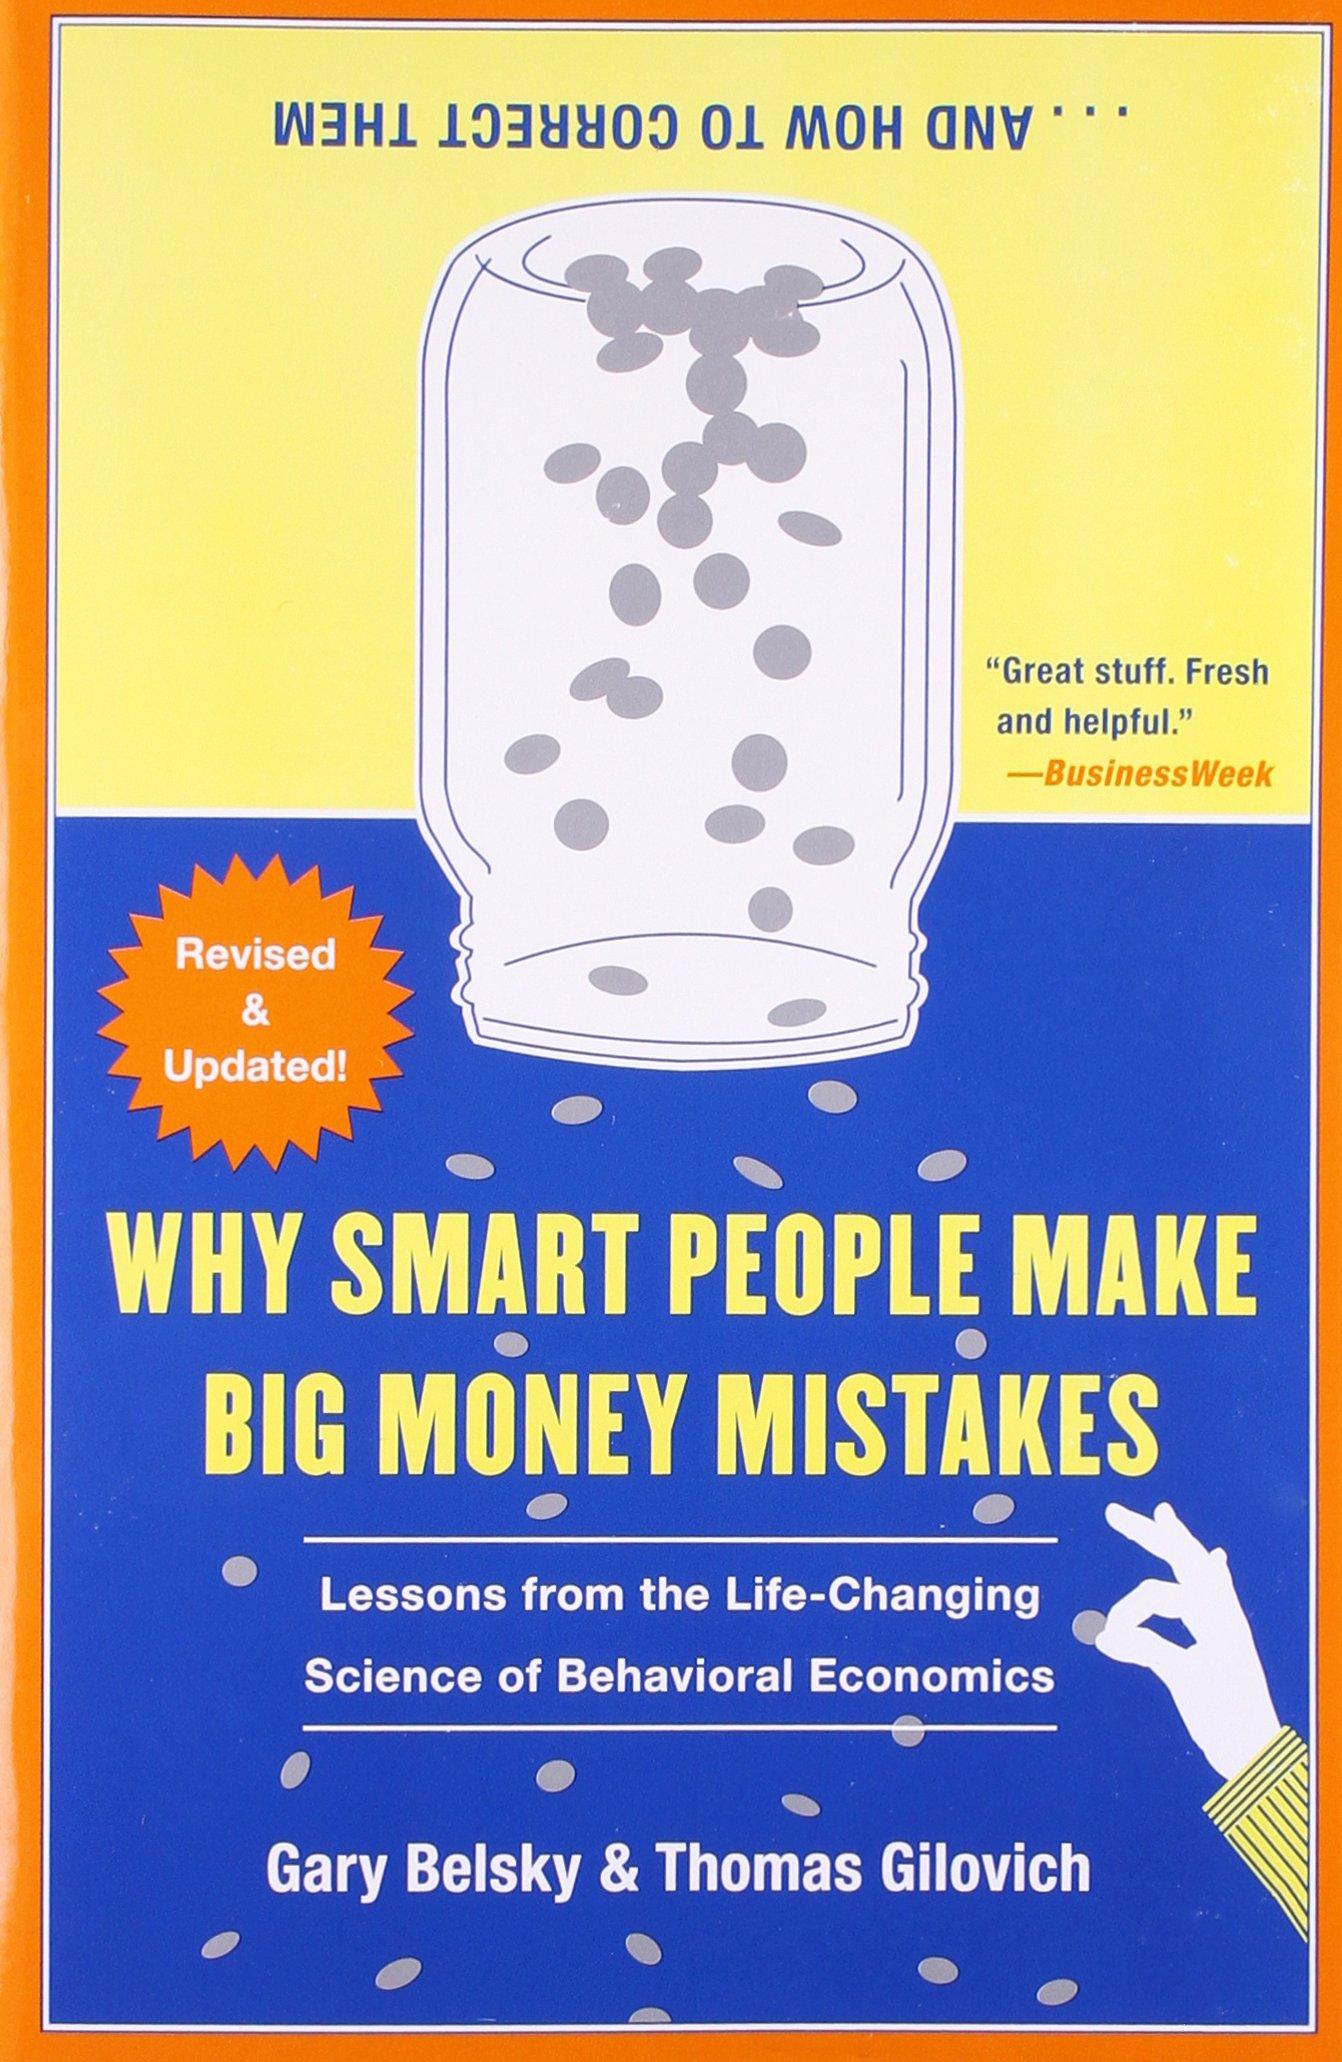 Smart People Money Mistakes Correct product image